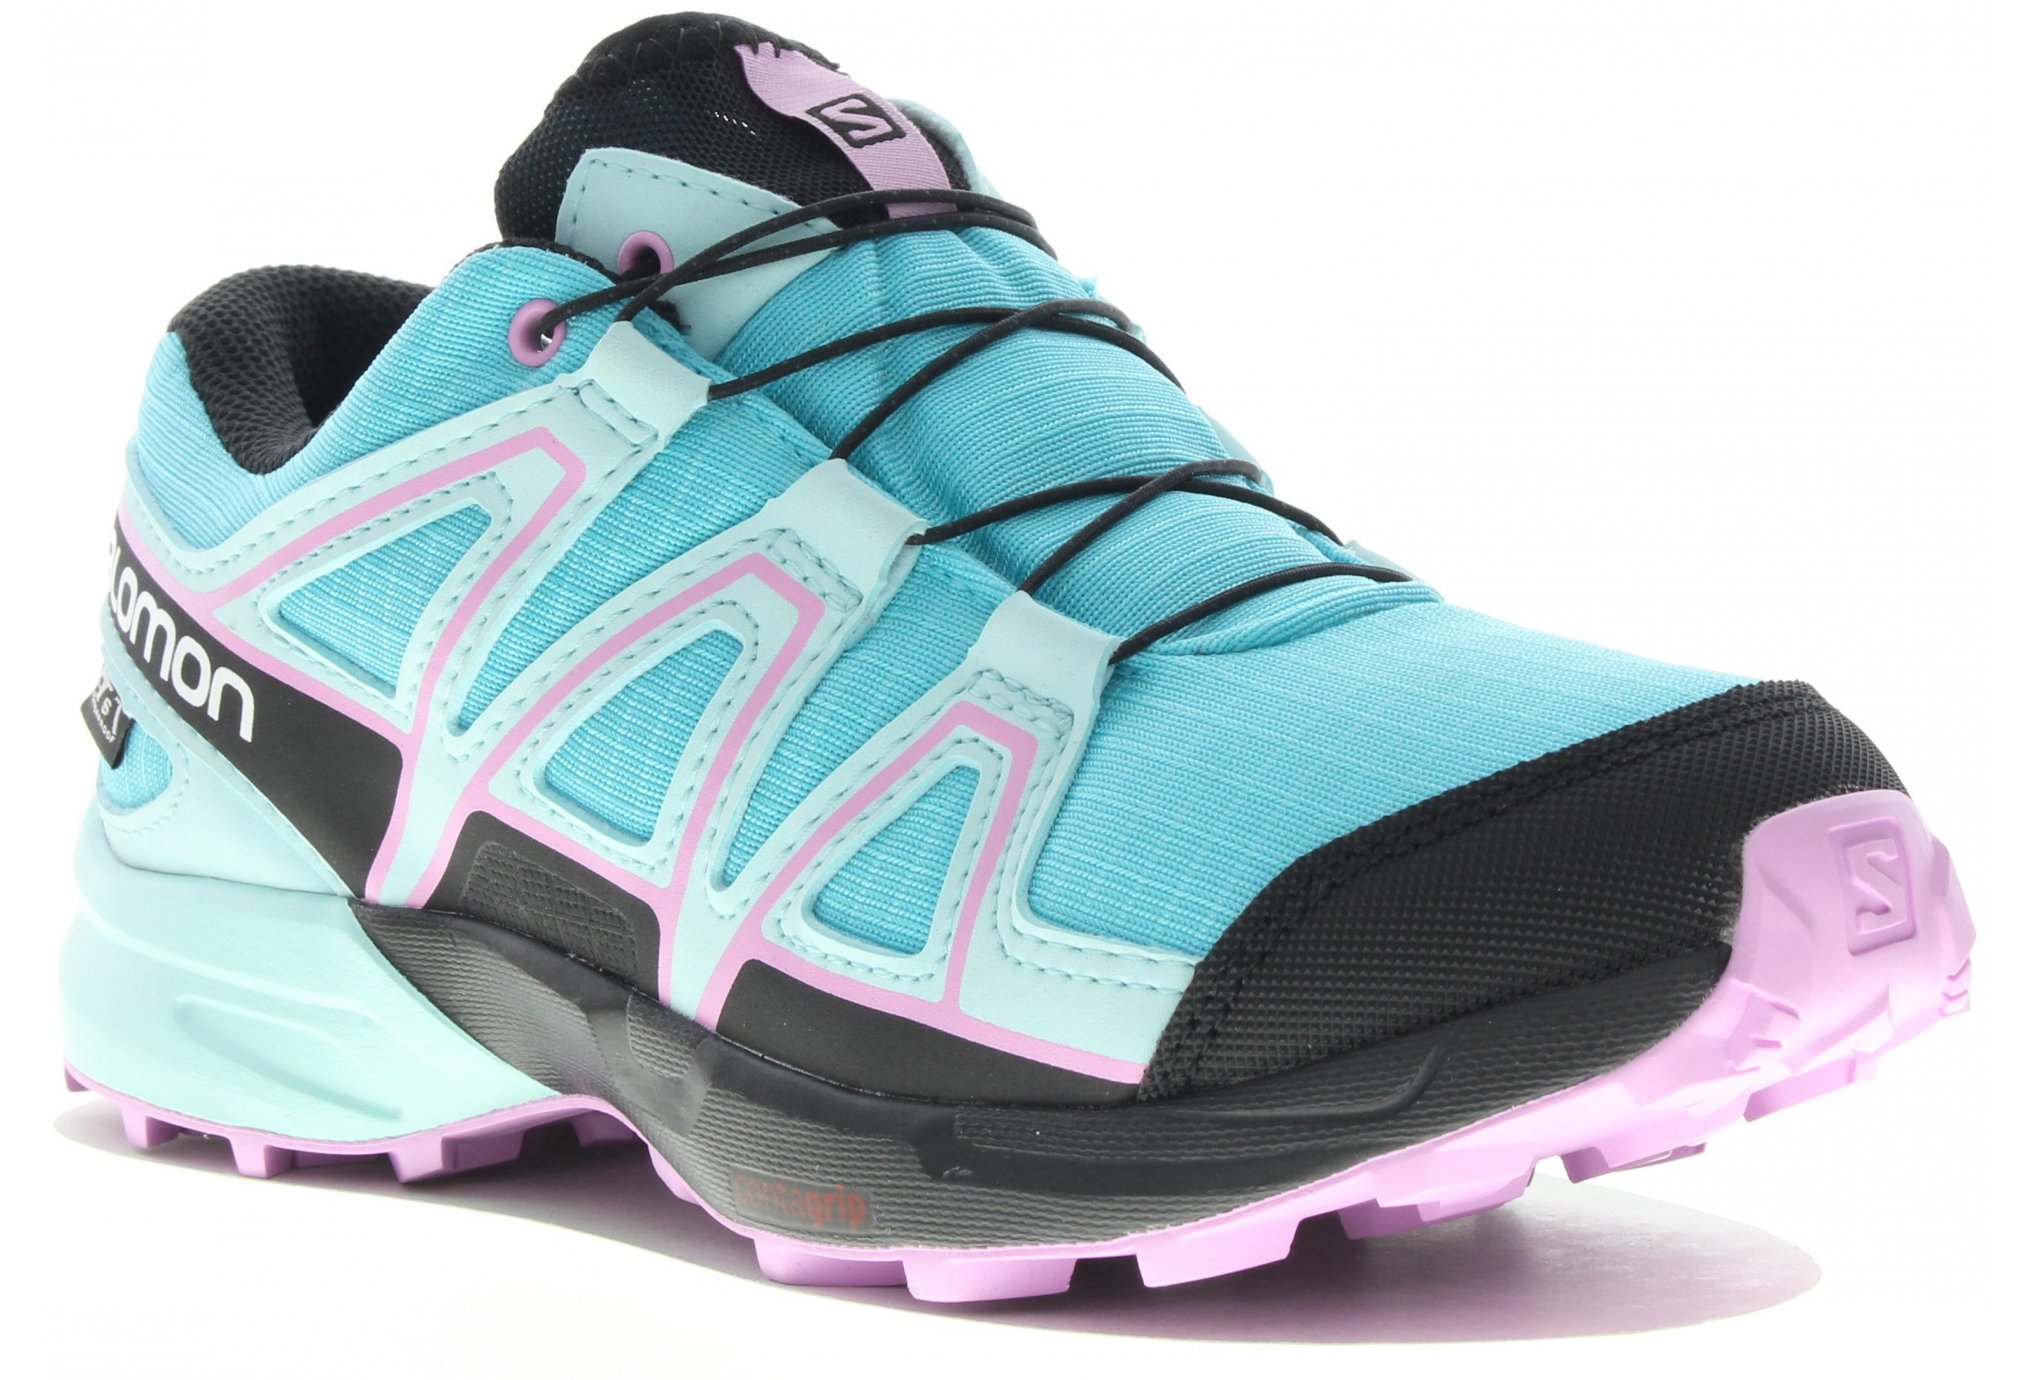 Salomon Speedcross CSWP Fille Chaussures running femme